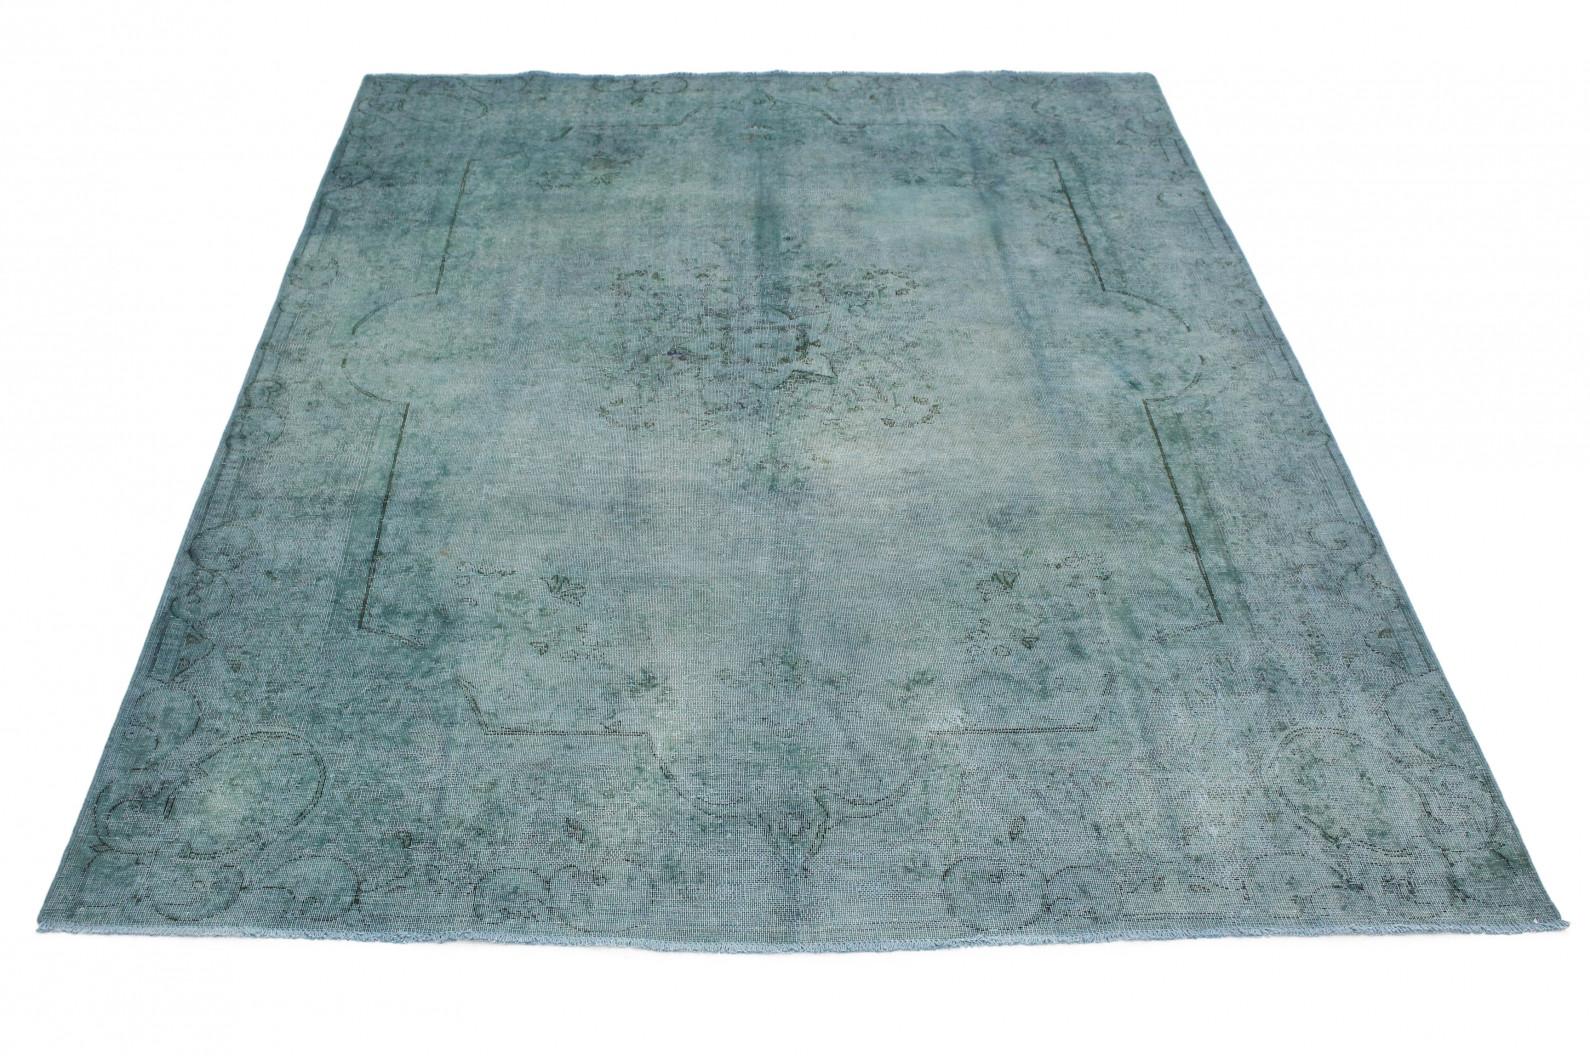 vintage teppich blau grau in 360x270 1001 3696 bei. Black Bedroom Furniture Sets. Home Design Ideas